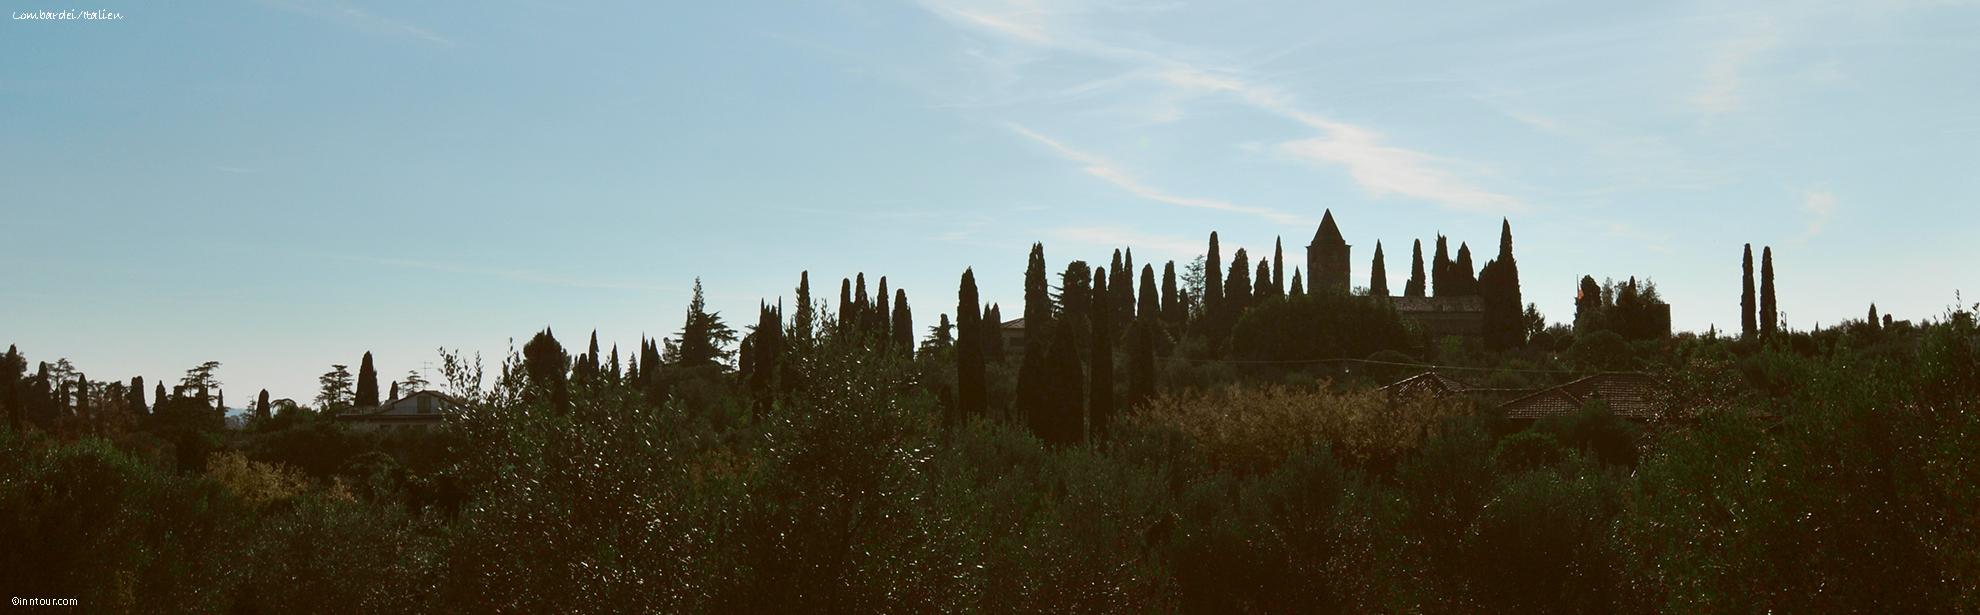 Osportinntour_Lombardei_DSC_1133